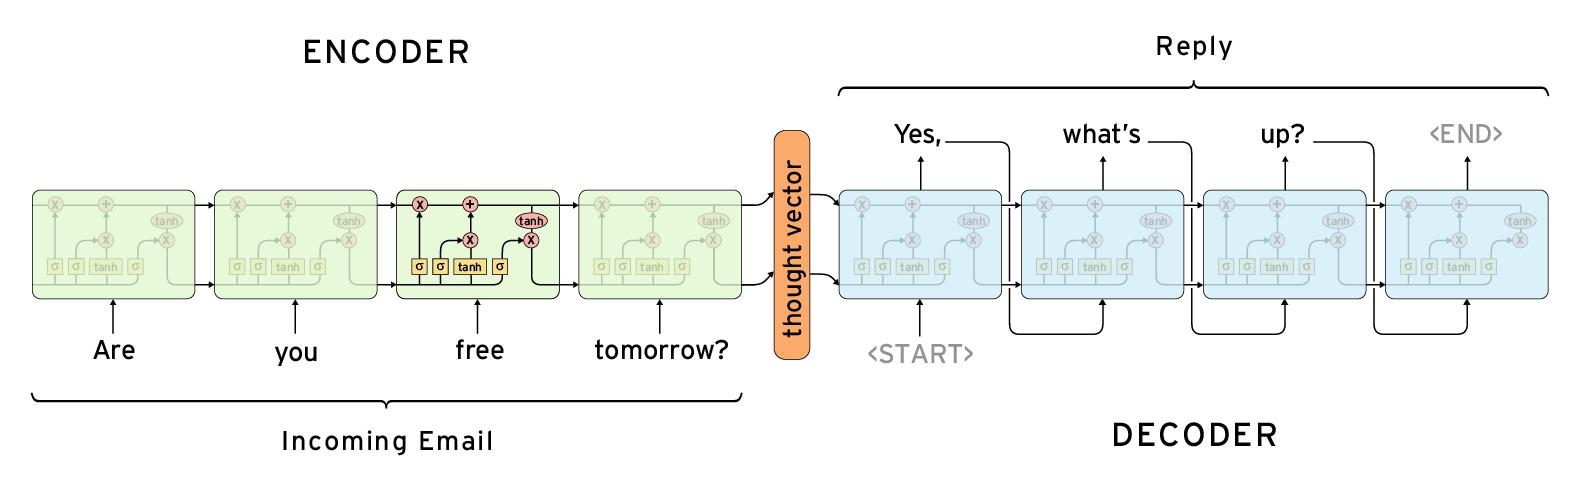 How to Run Text Summarization with TensorFlow | Pavel Surmenok